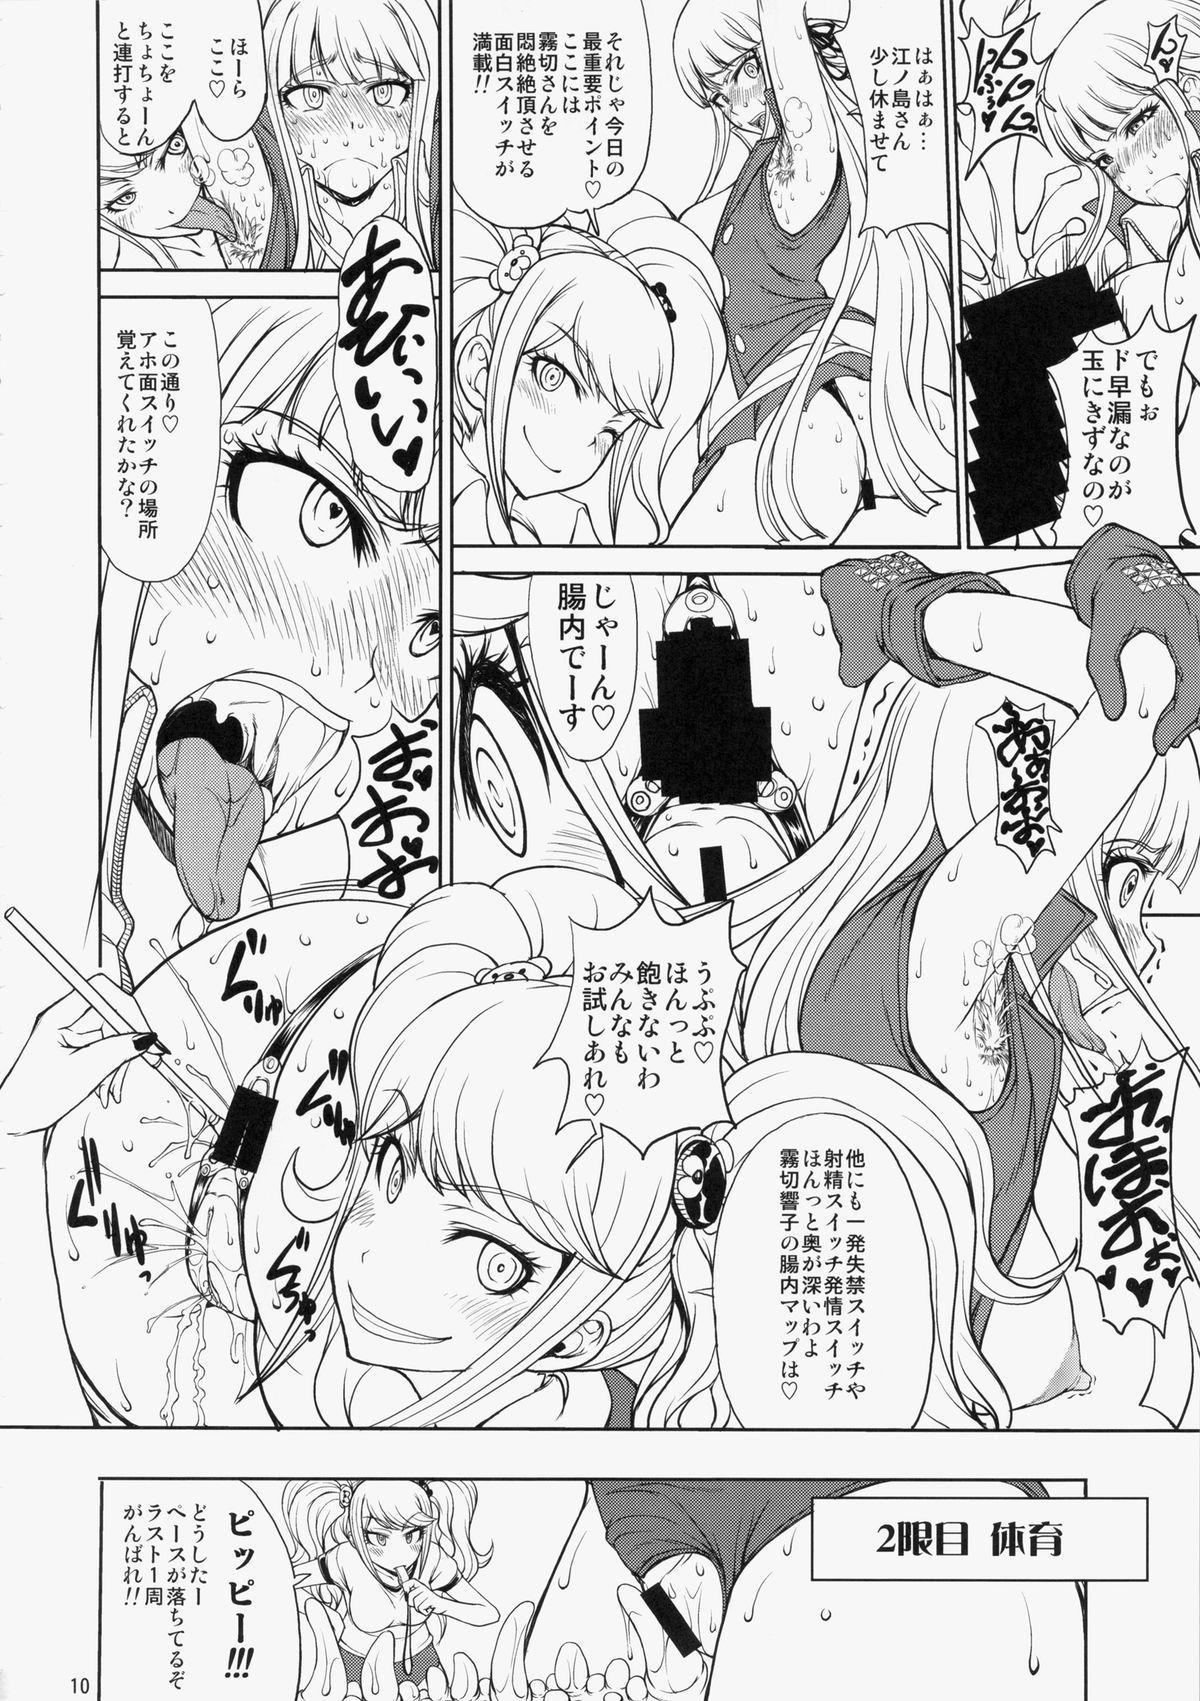 (C85) [Majimadou (Matou)] Enoshima-sensei no Chou Zetsubou-teki Zecchou Jugyou (Danganronpa) 8